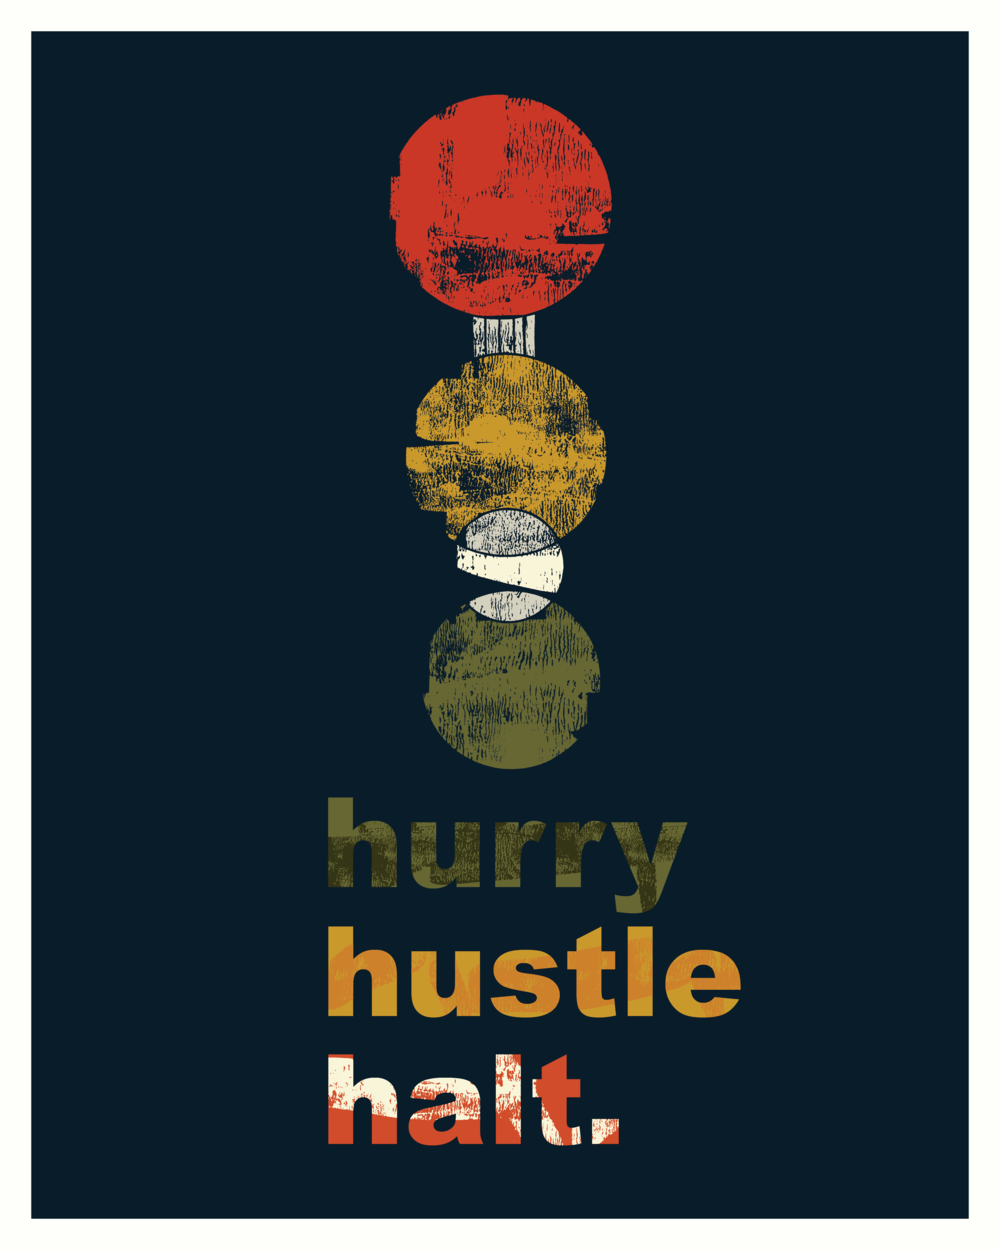 Print campaign concept art, 2018.